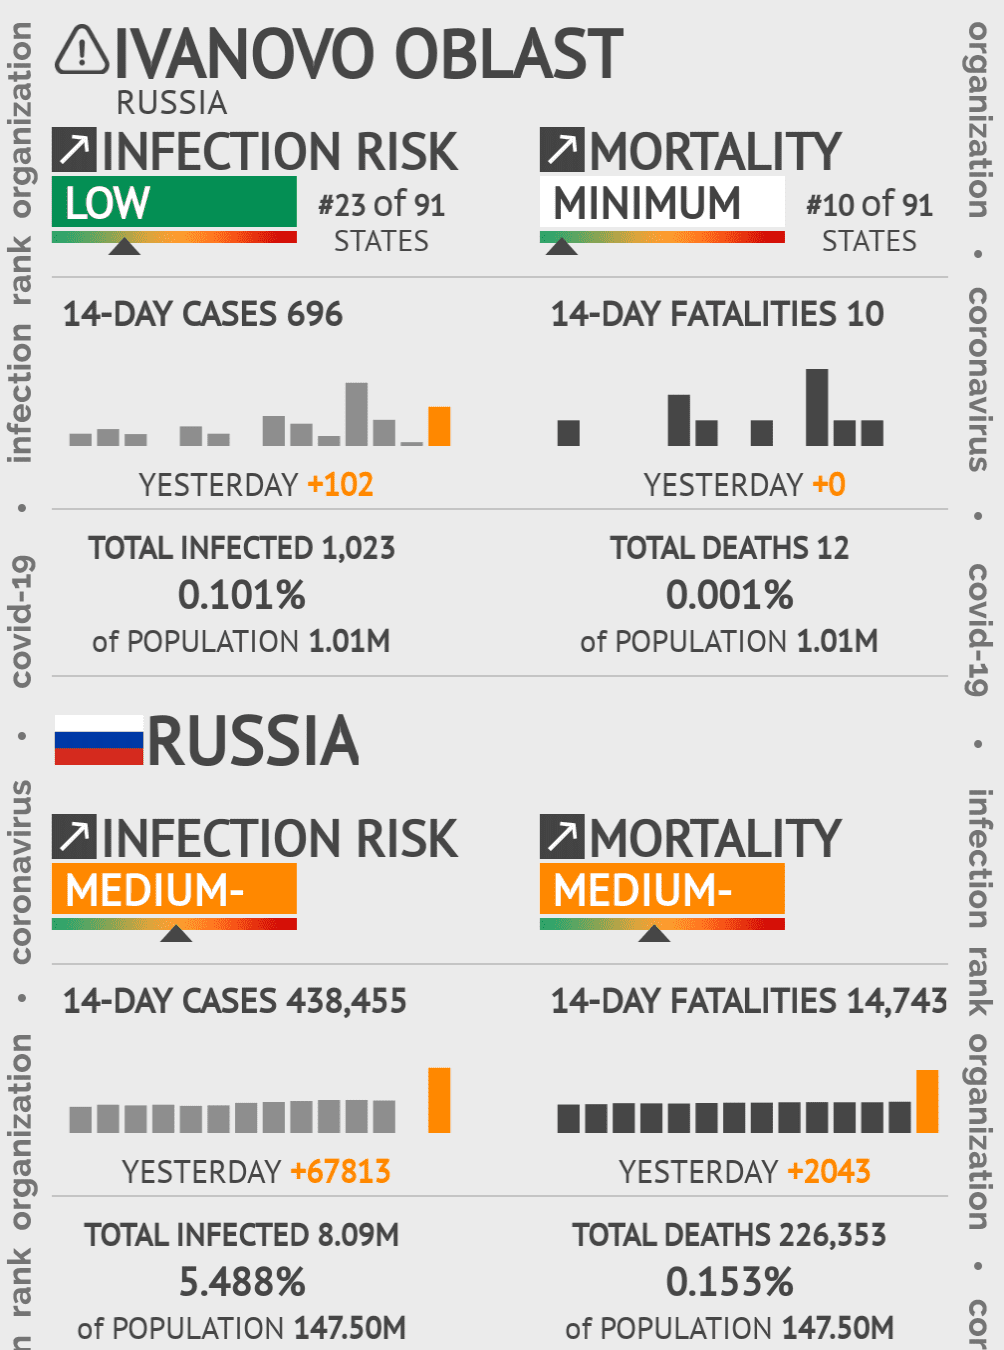 Ivanovo Oblast Coronavirus Covid-19 Risk of Infection on May 14, 2020